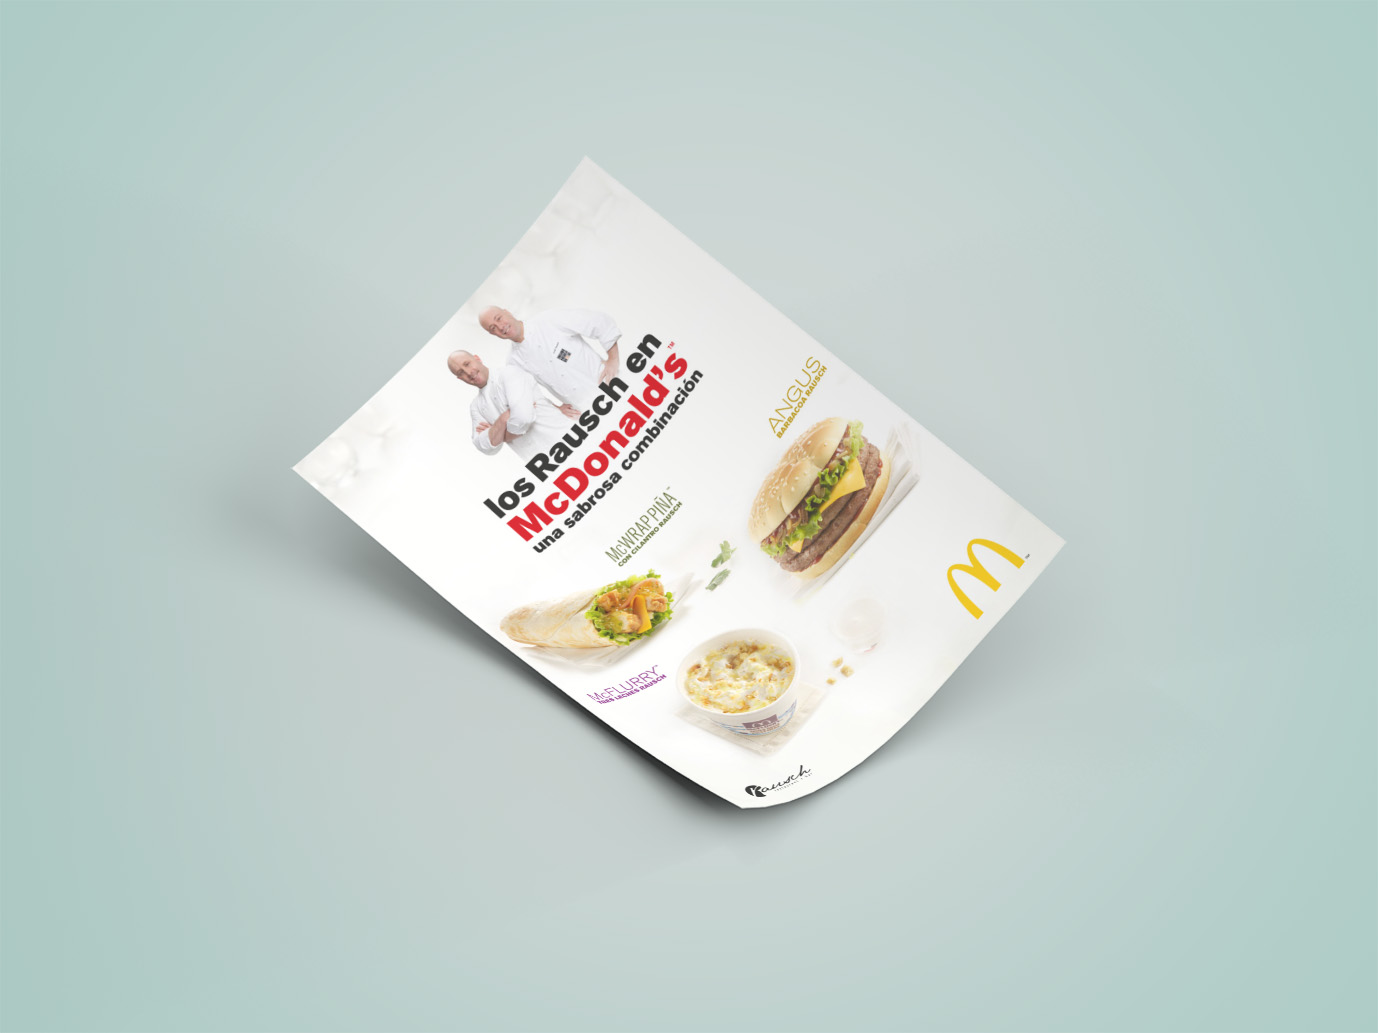 McDonald's Colombia